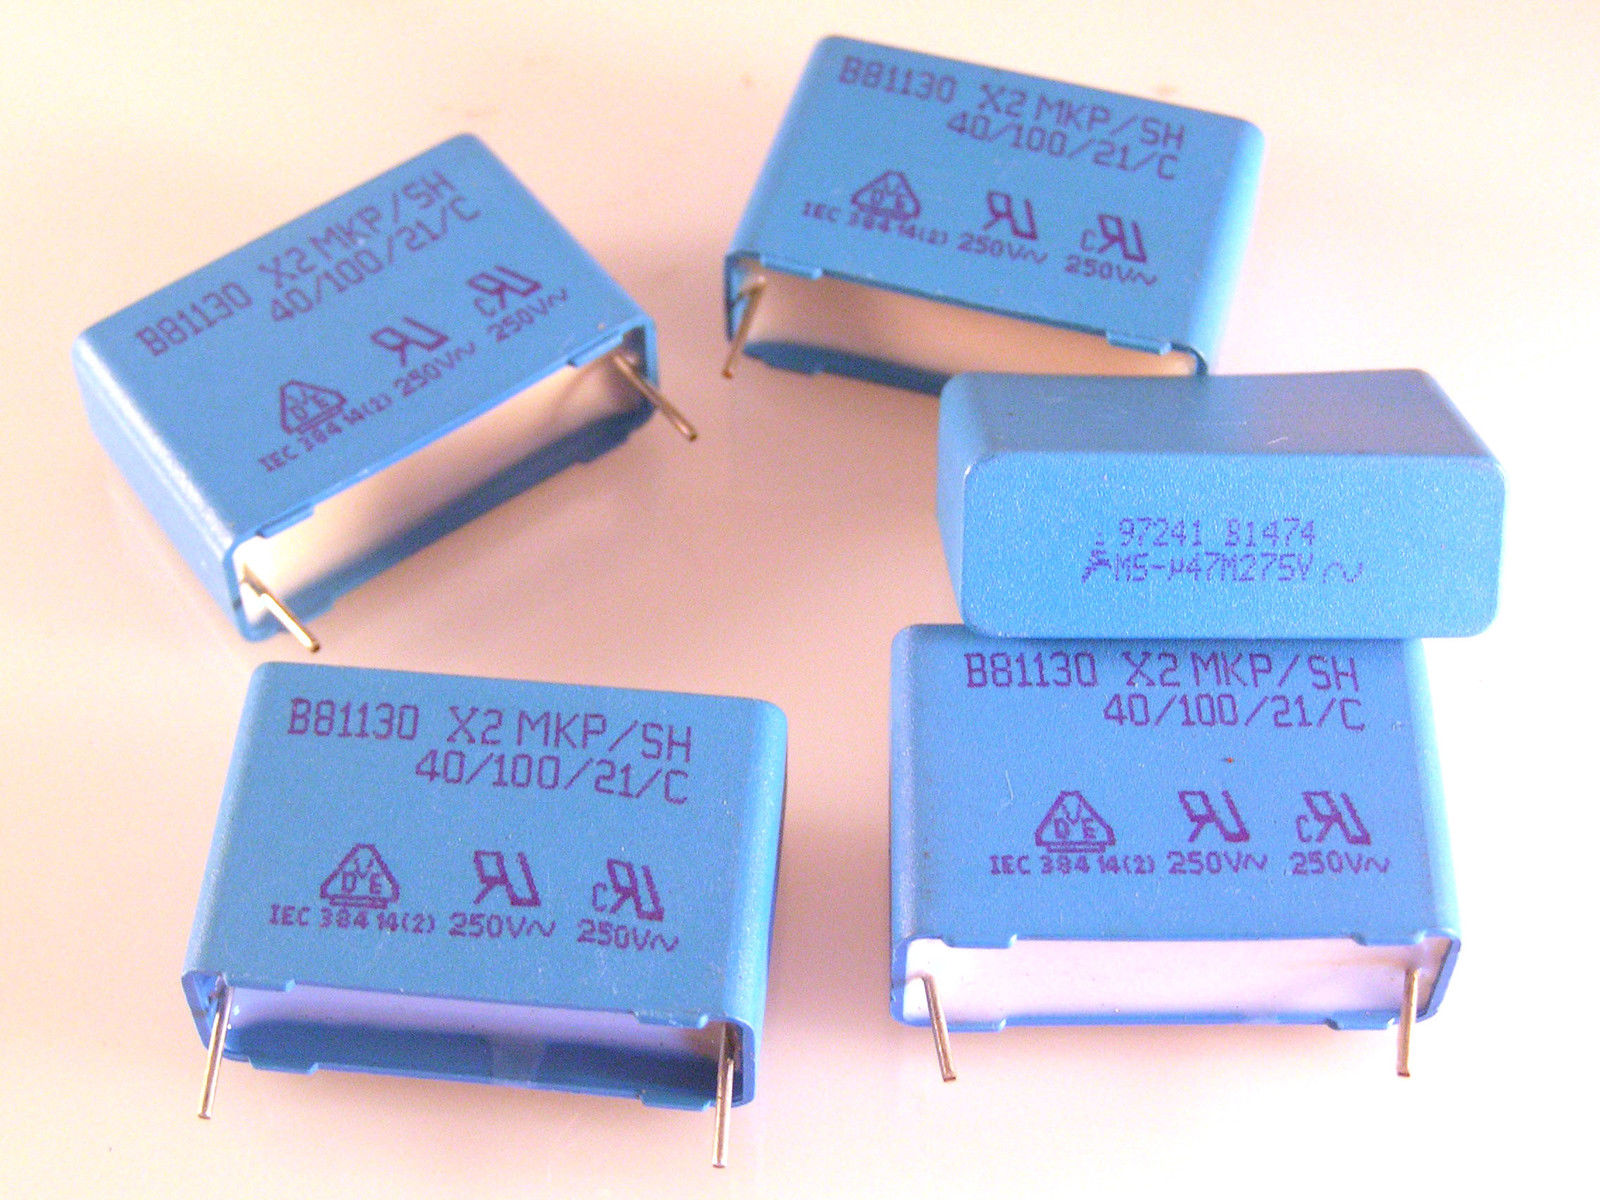 Epcos Metal Film Polyester Capacitor MKP//SH B81122 A1153M 15nf  250V 4pcs OL0418